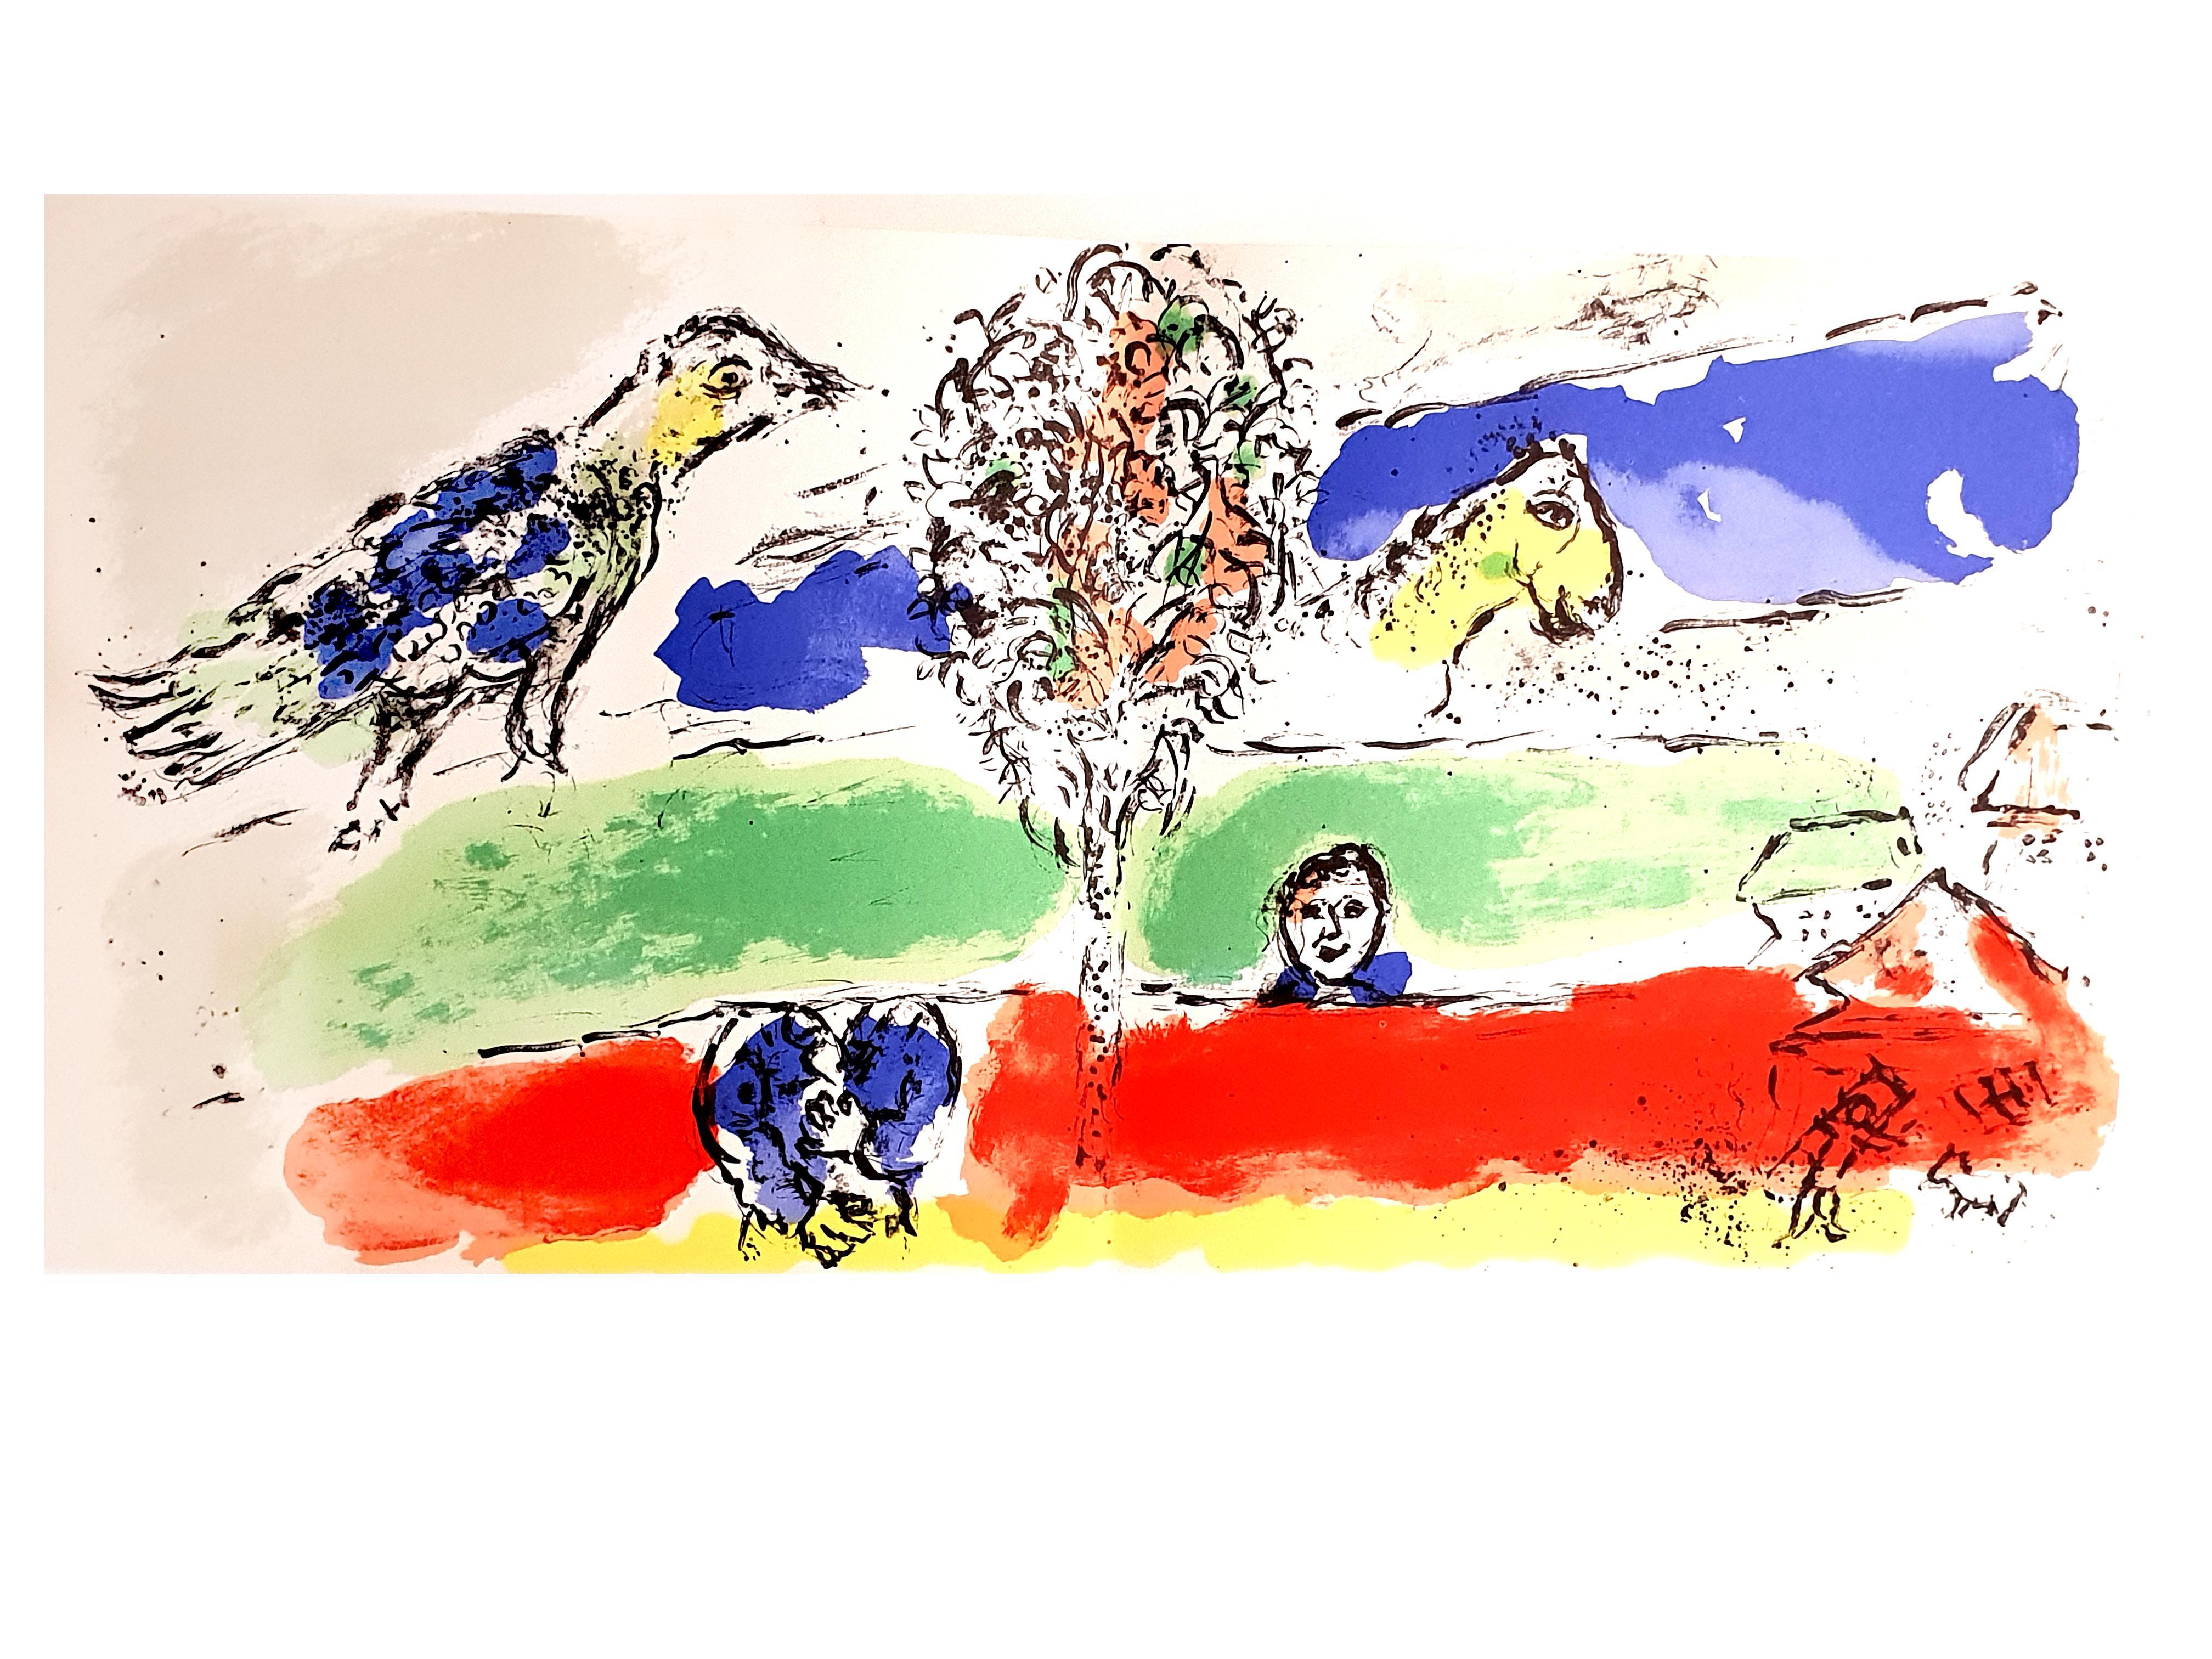 Marc Chagall - Green River - Original Lithograph